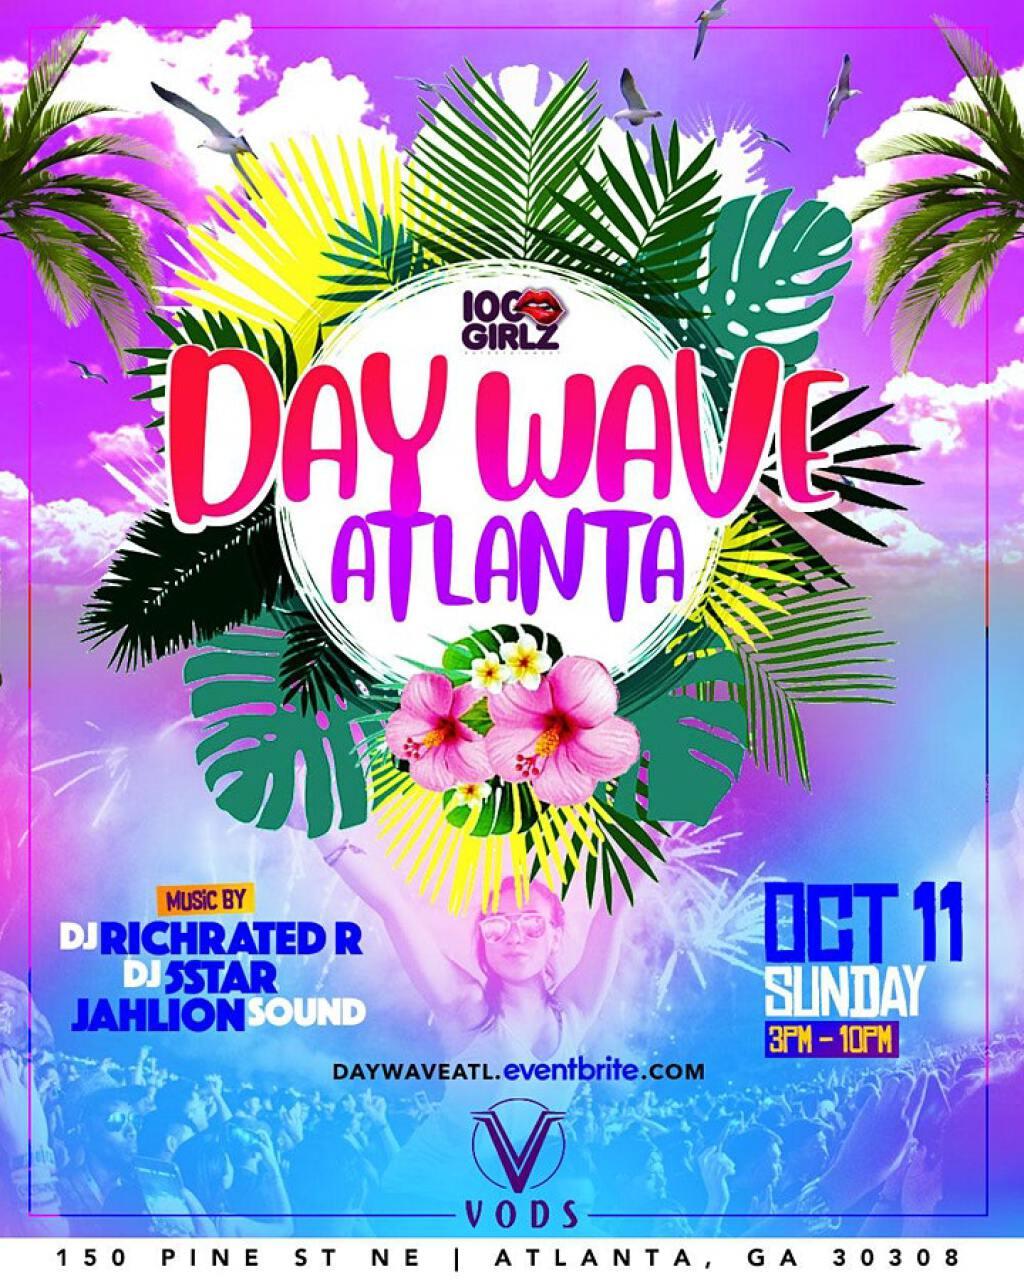 Day Wave Atlanta flyer or graphic.